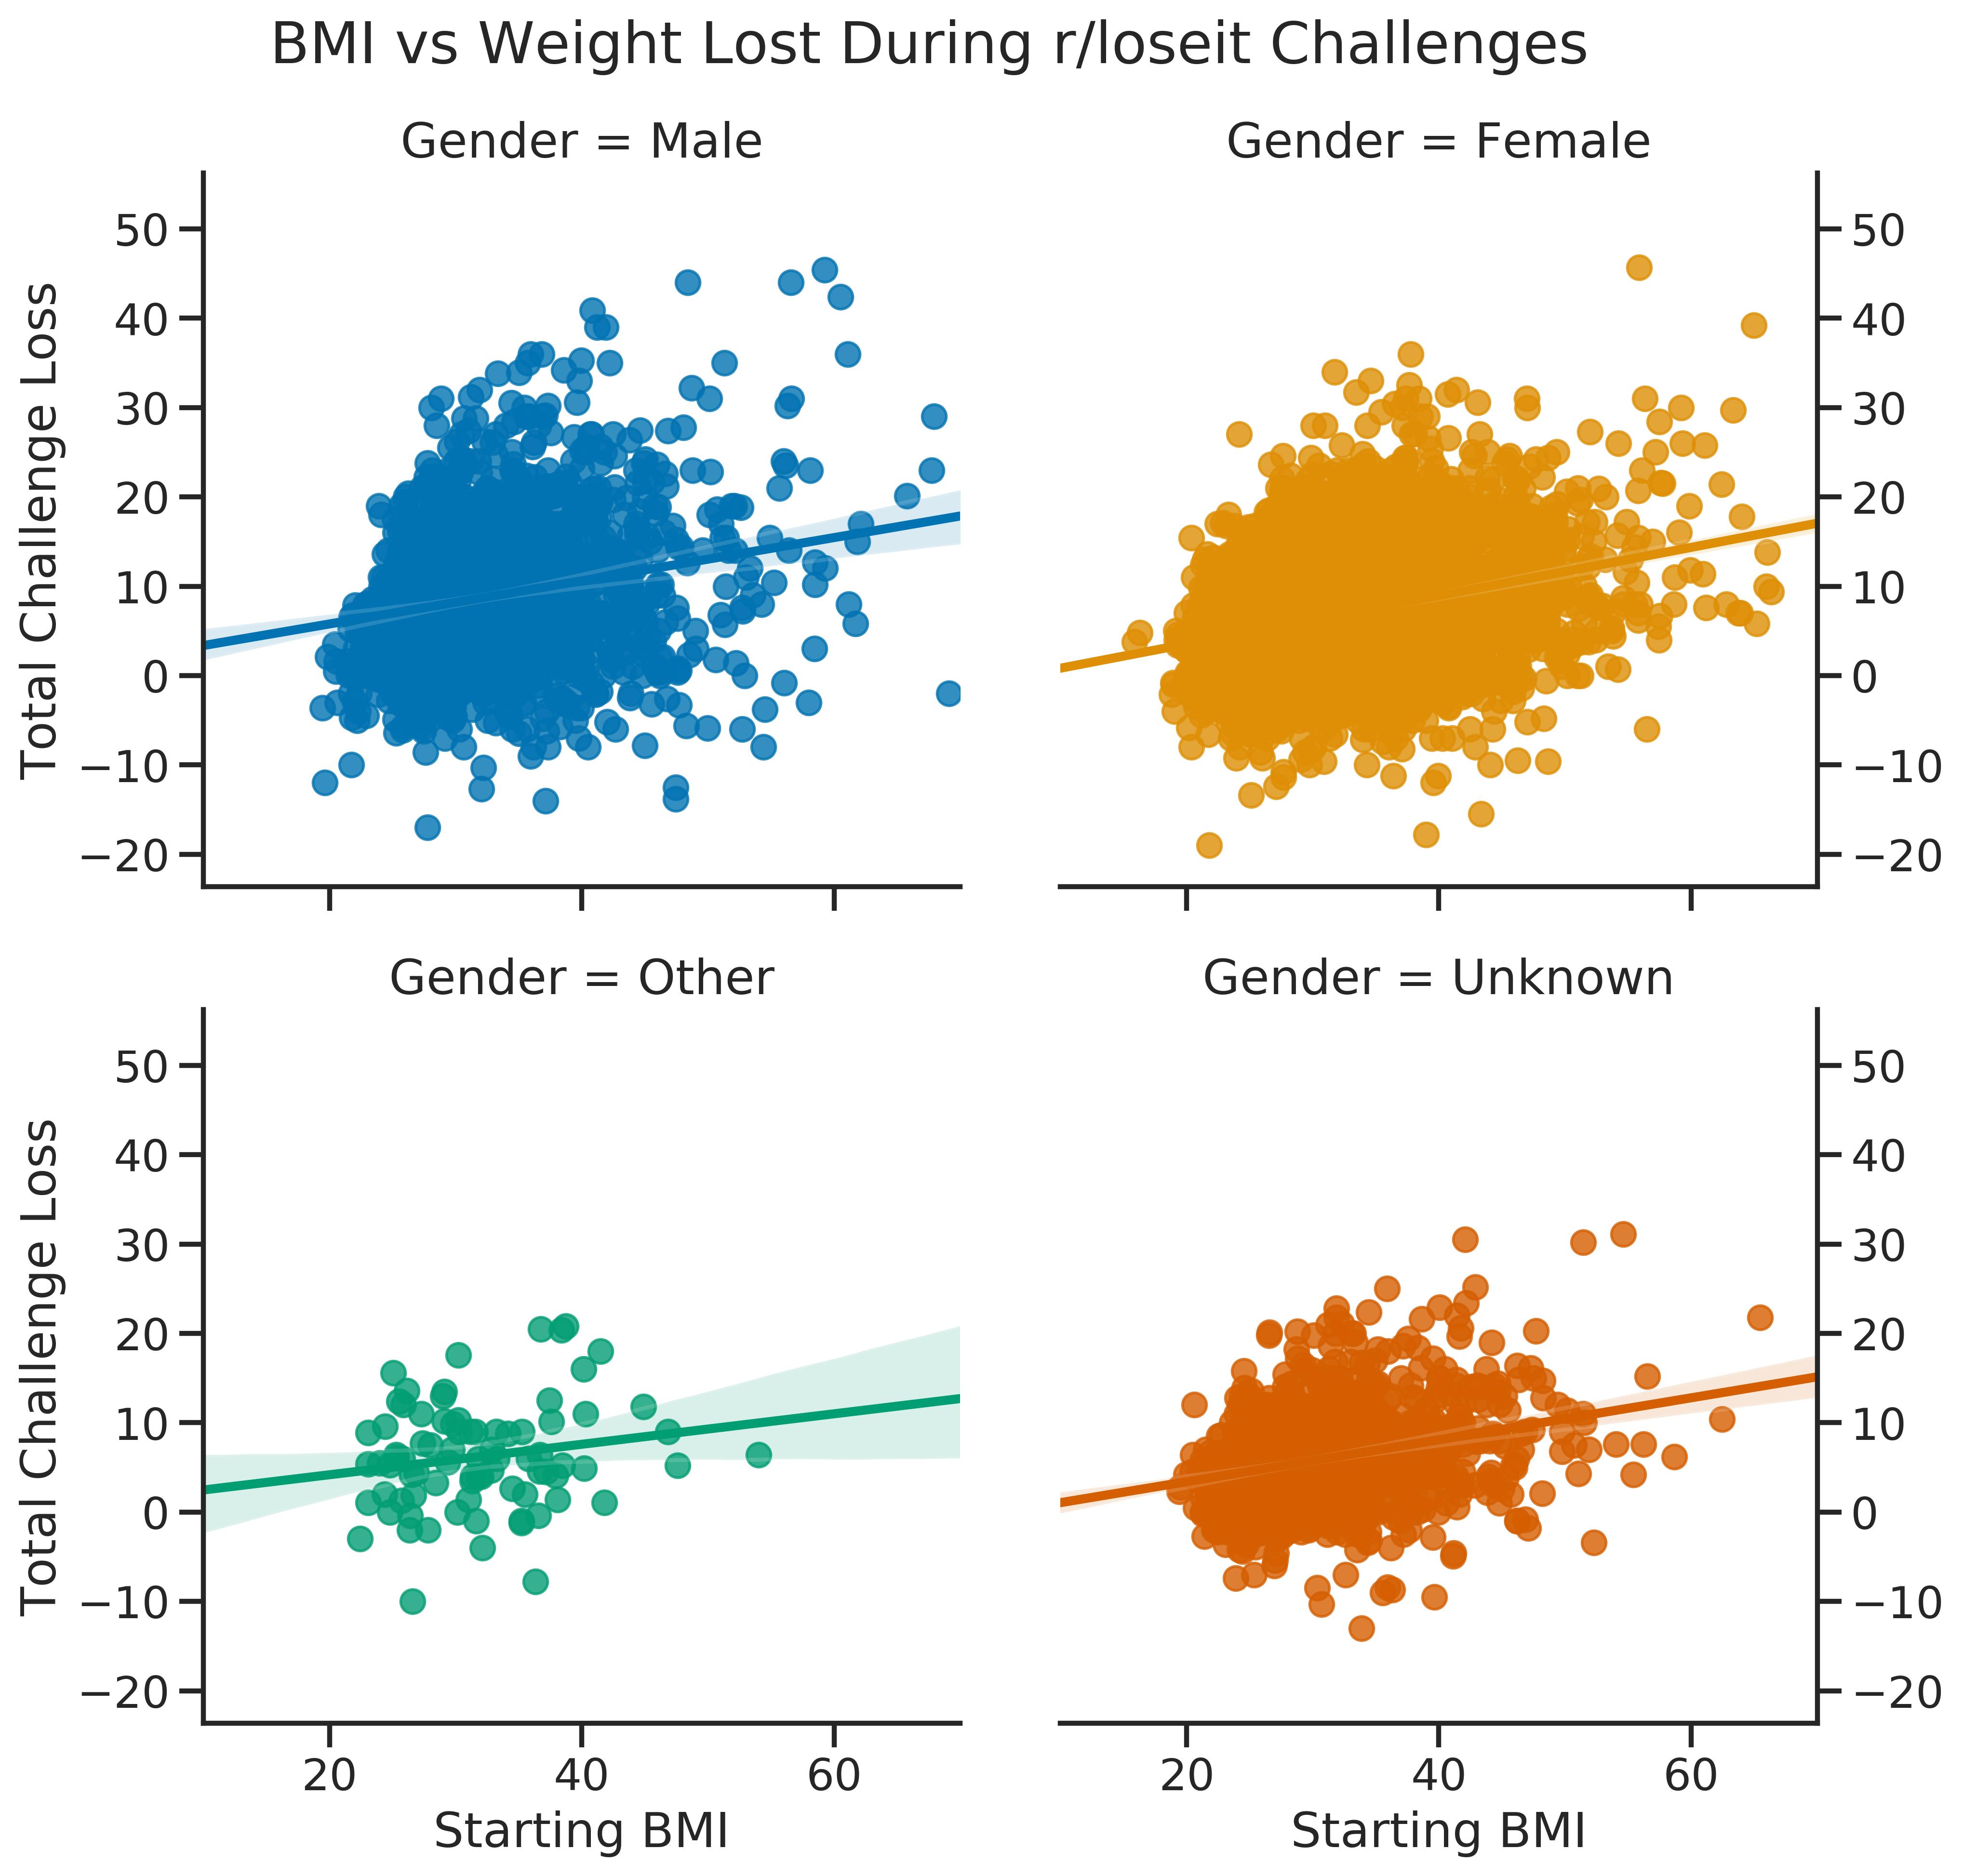 scatter gender weight loss v bmi